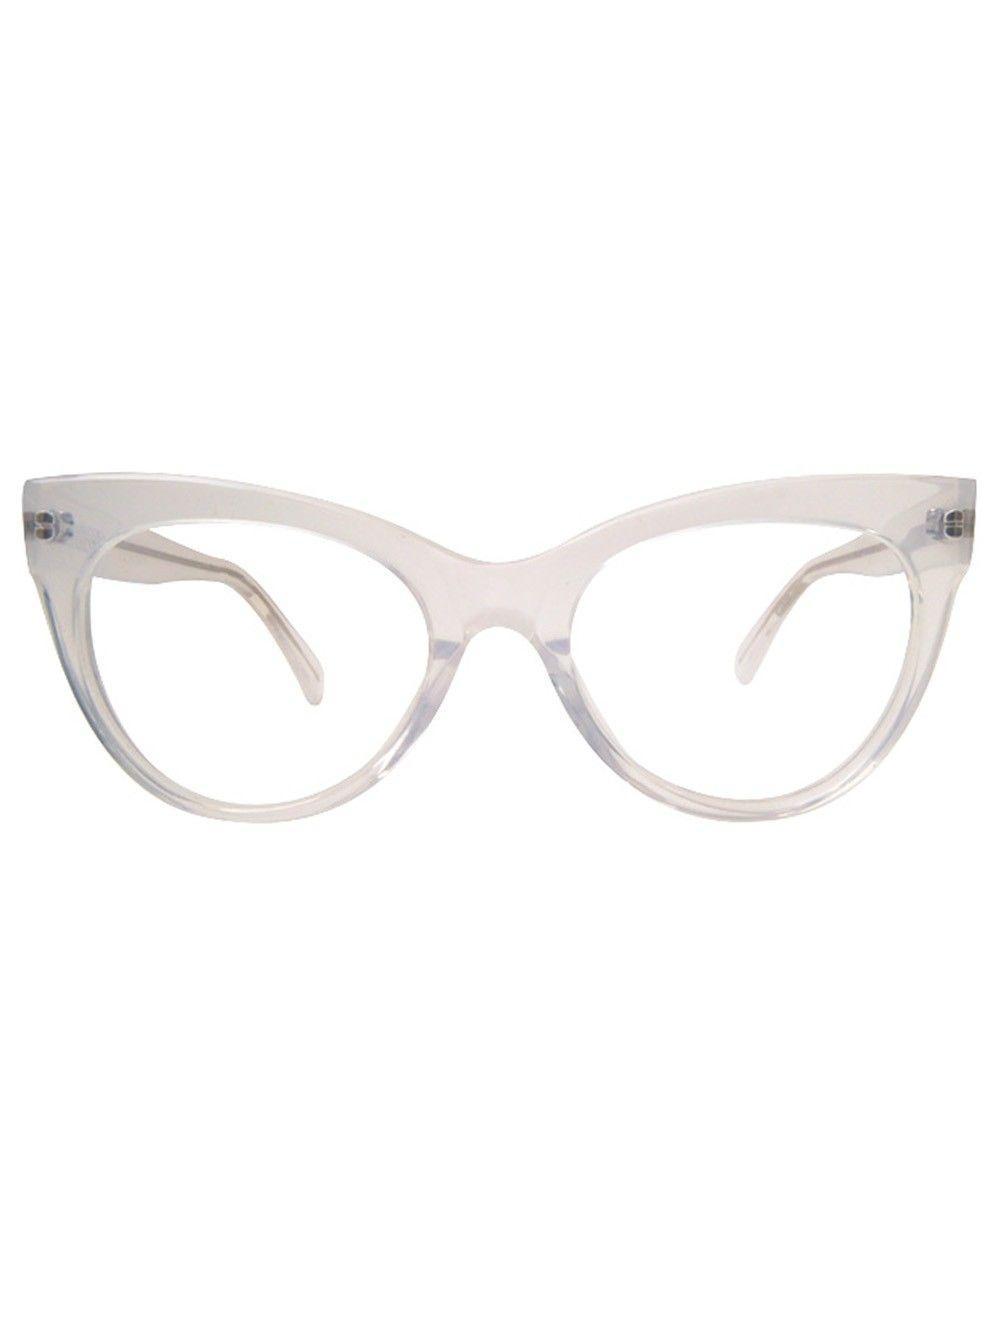 Square Cat Eye Glasses / Clear - Sunglasses - Shop ...